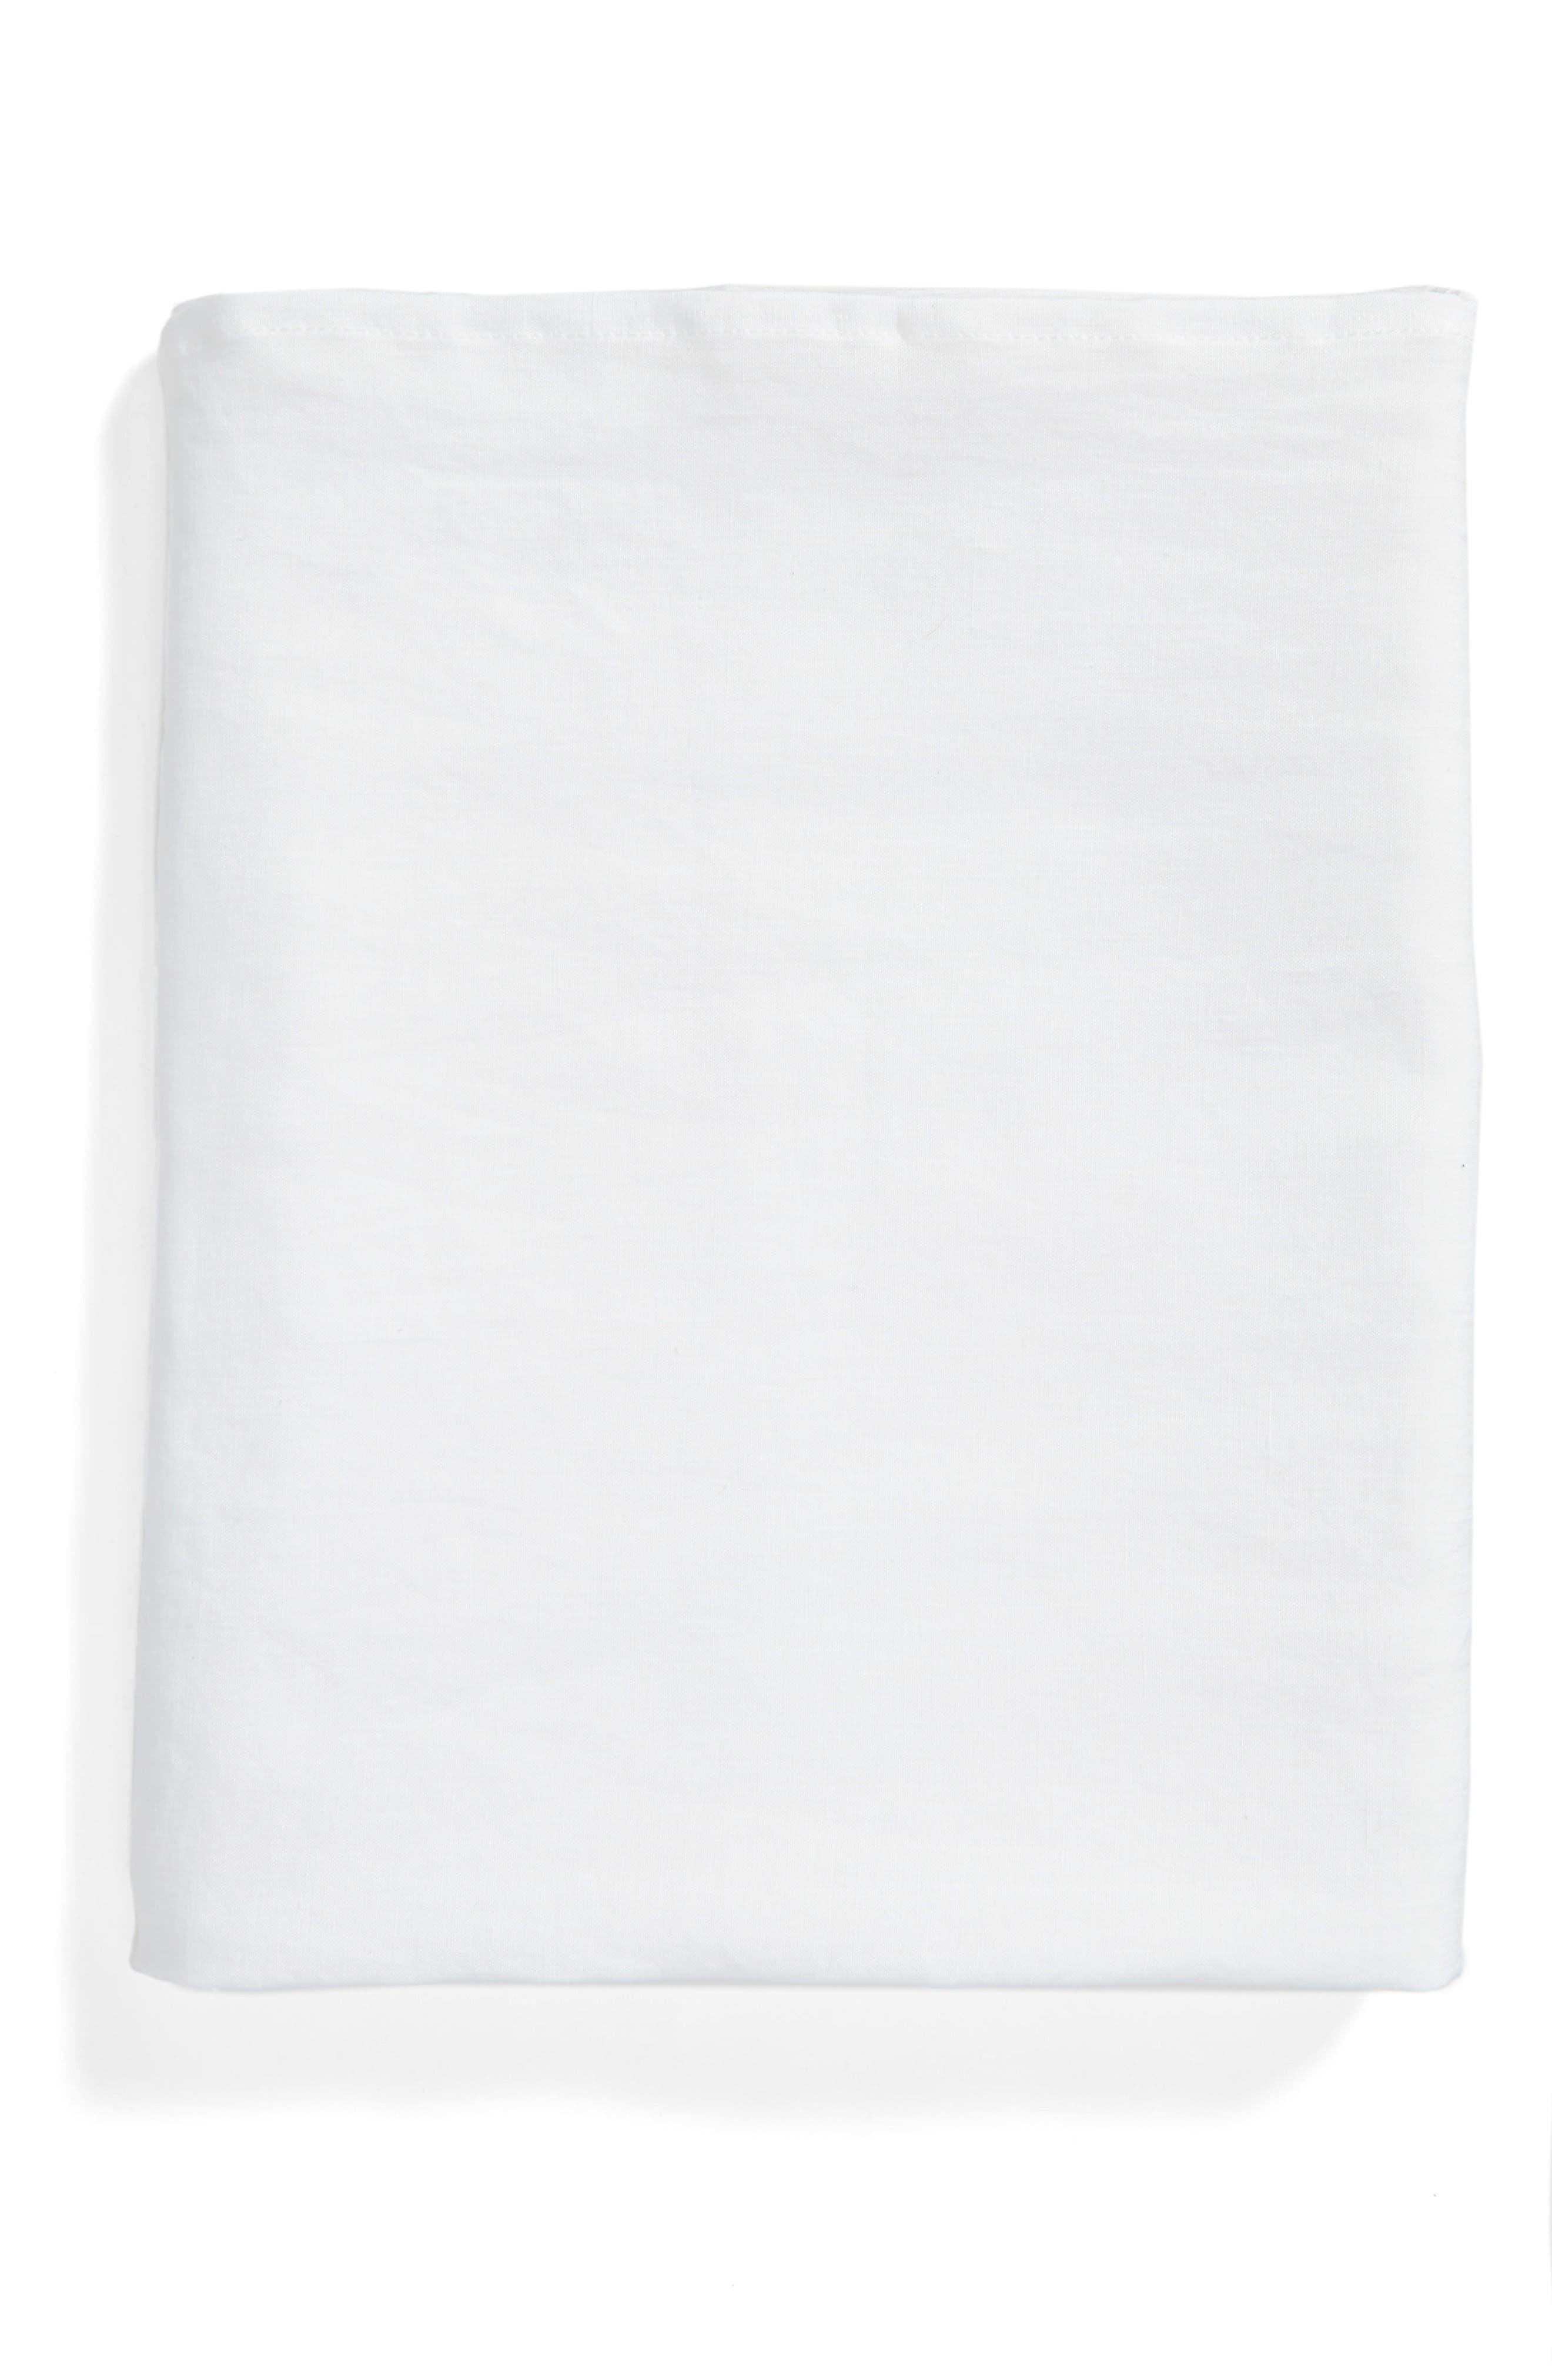 Washed Linen Tablecloth,                             Main thumbnail 2, color,